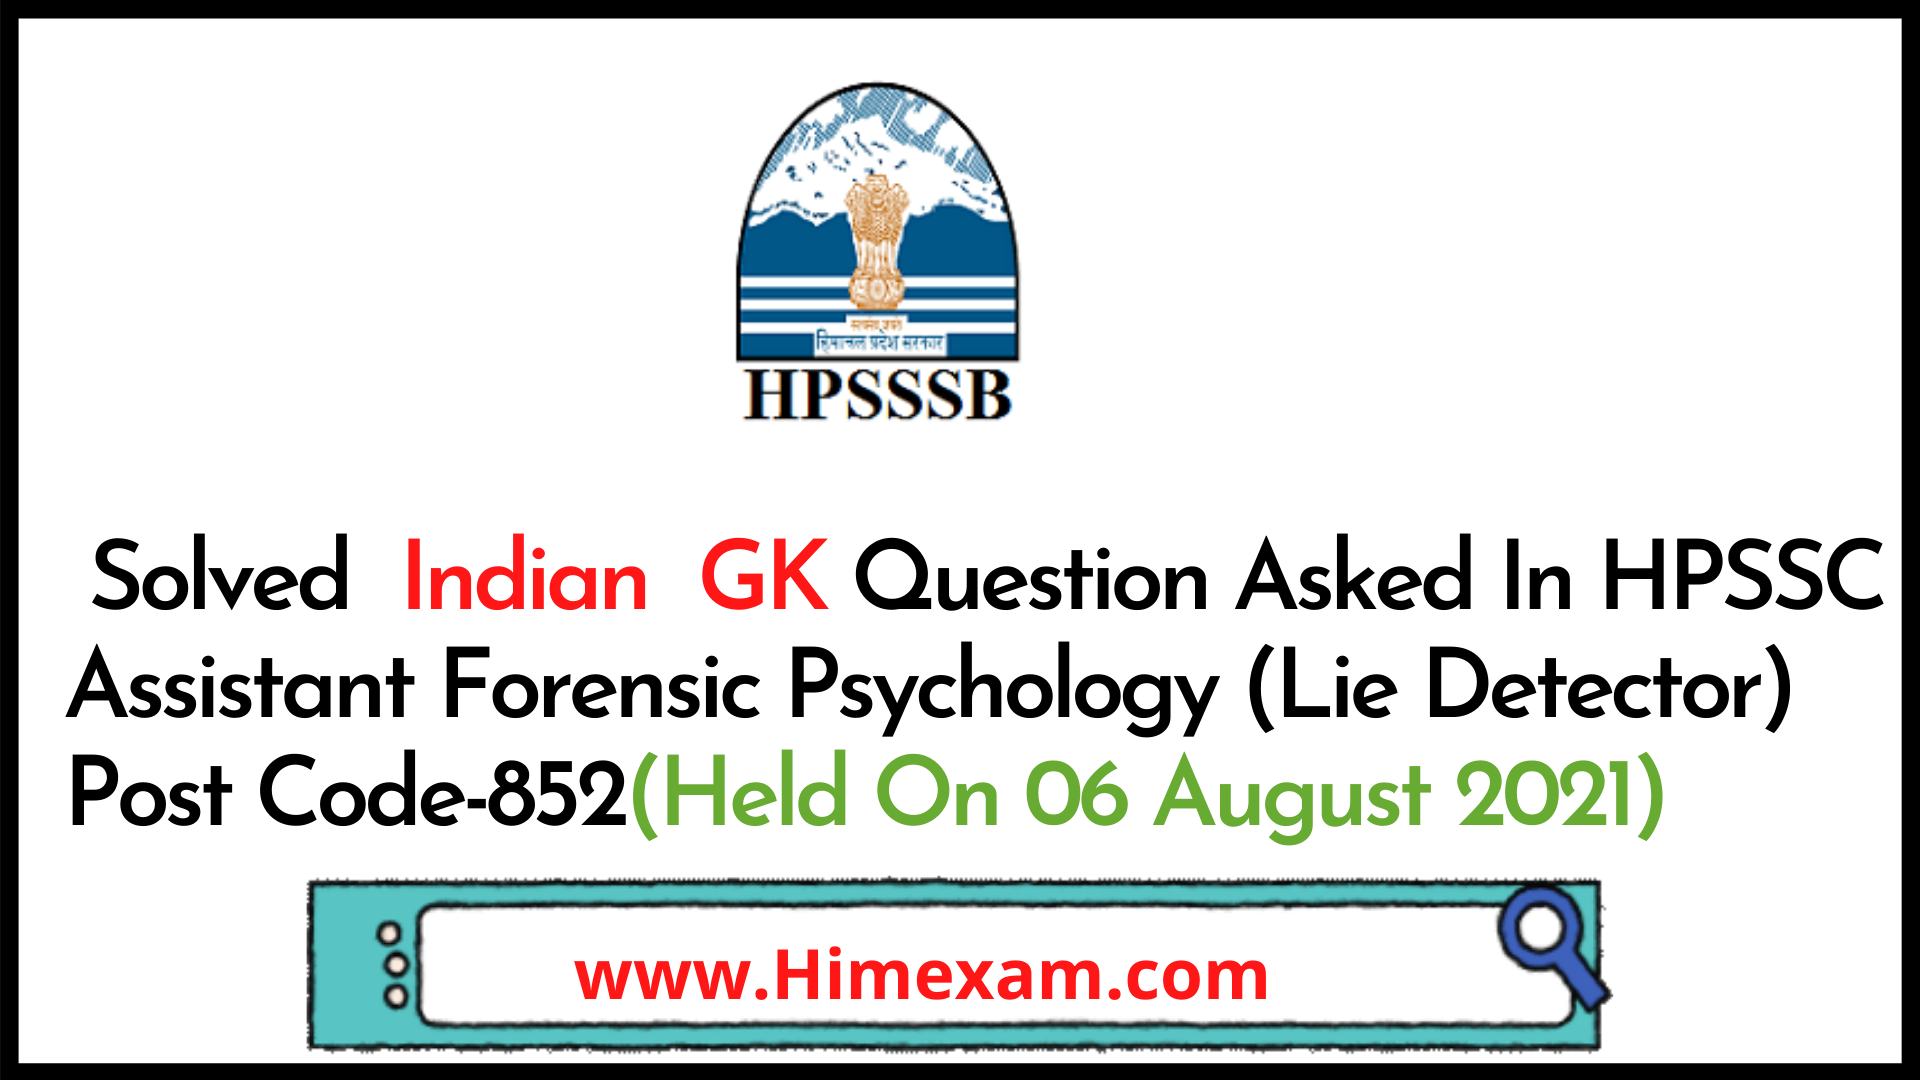 Solved Indian GK Question Asked In HPSSC Assistant Forensic Psychology (Lie Detector) Post Code-852